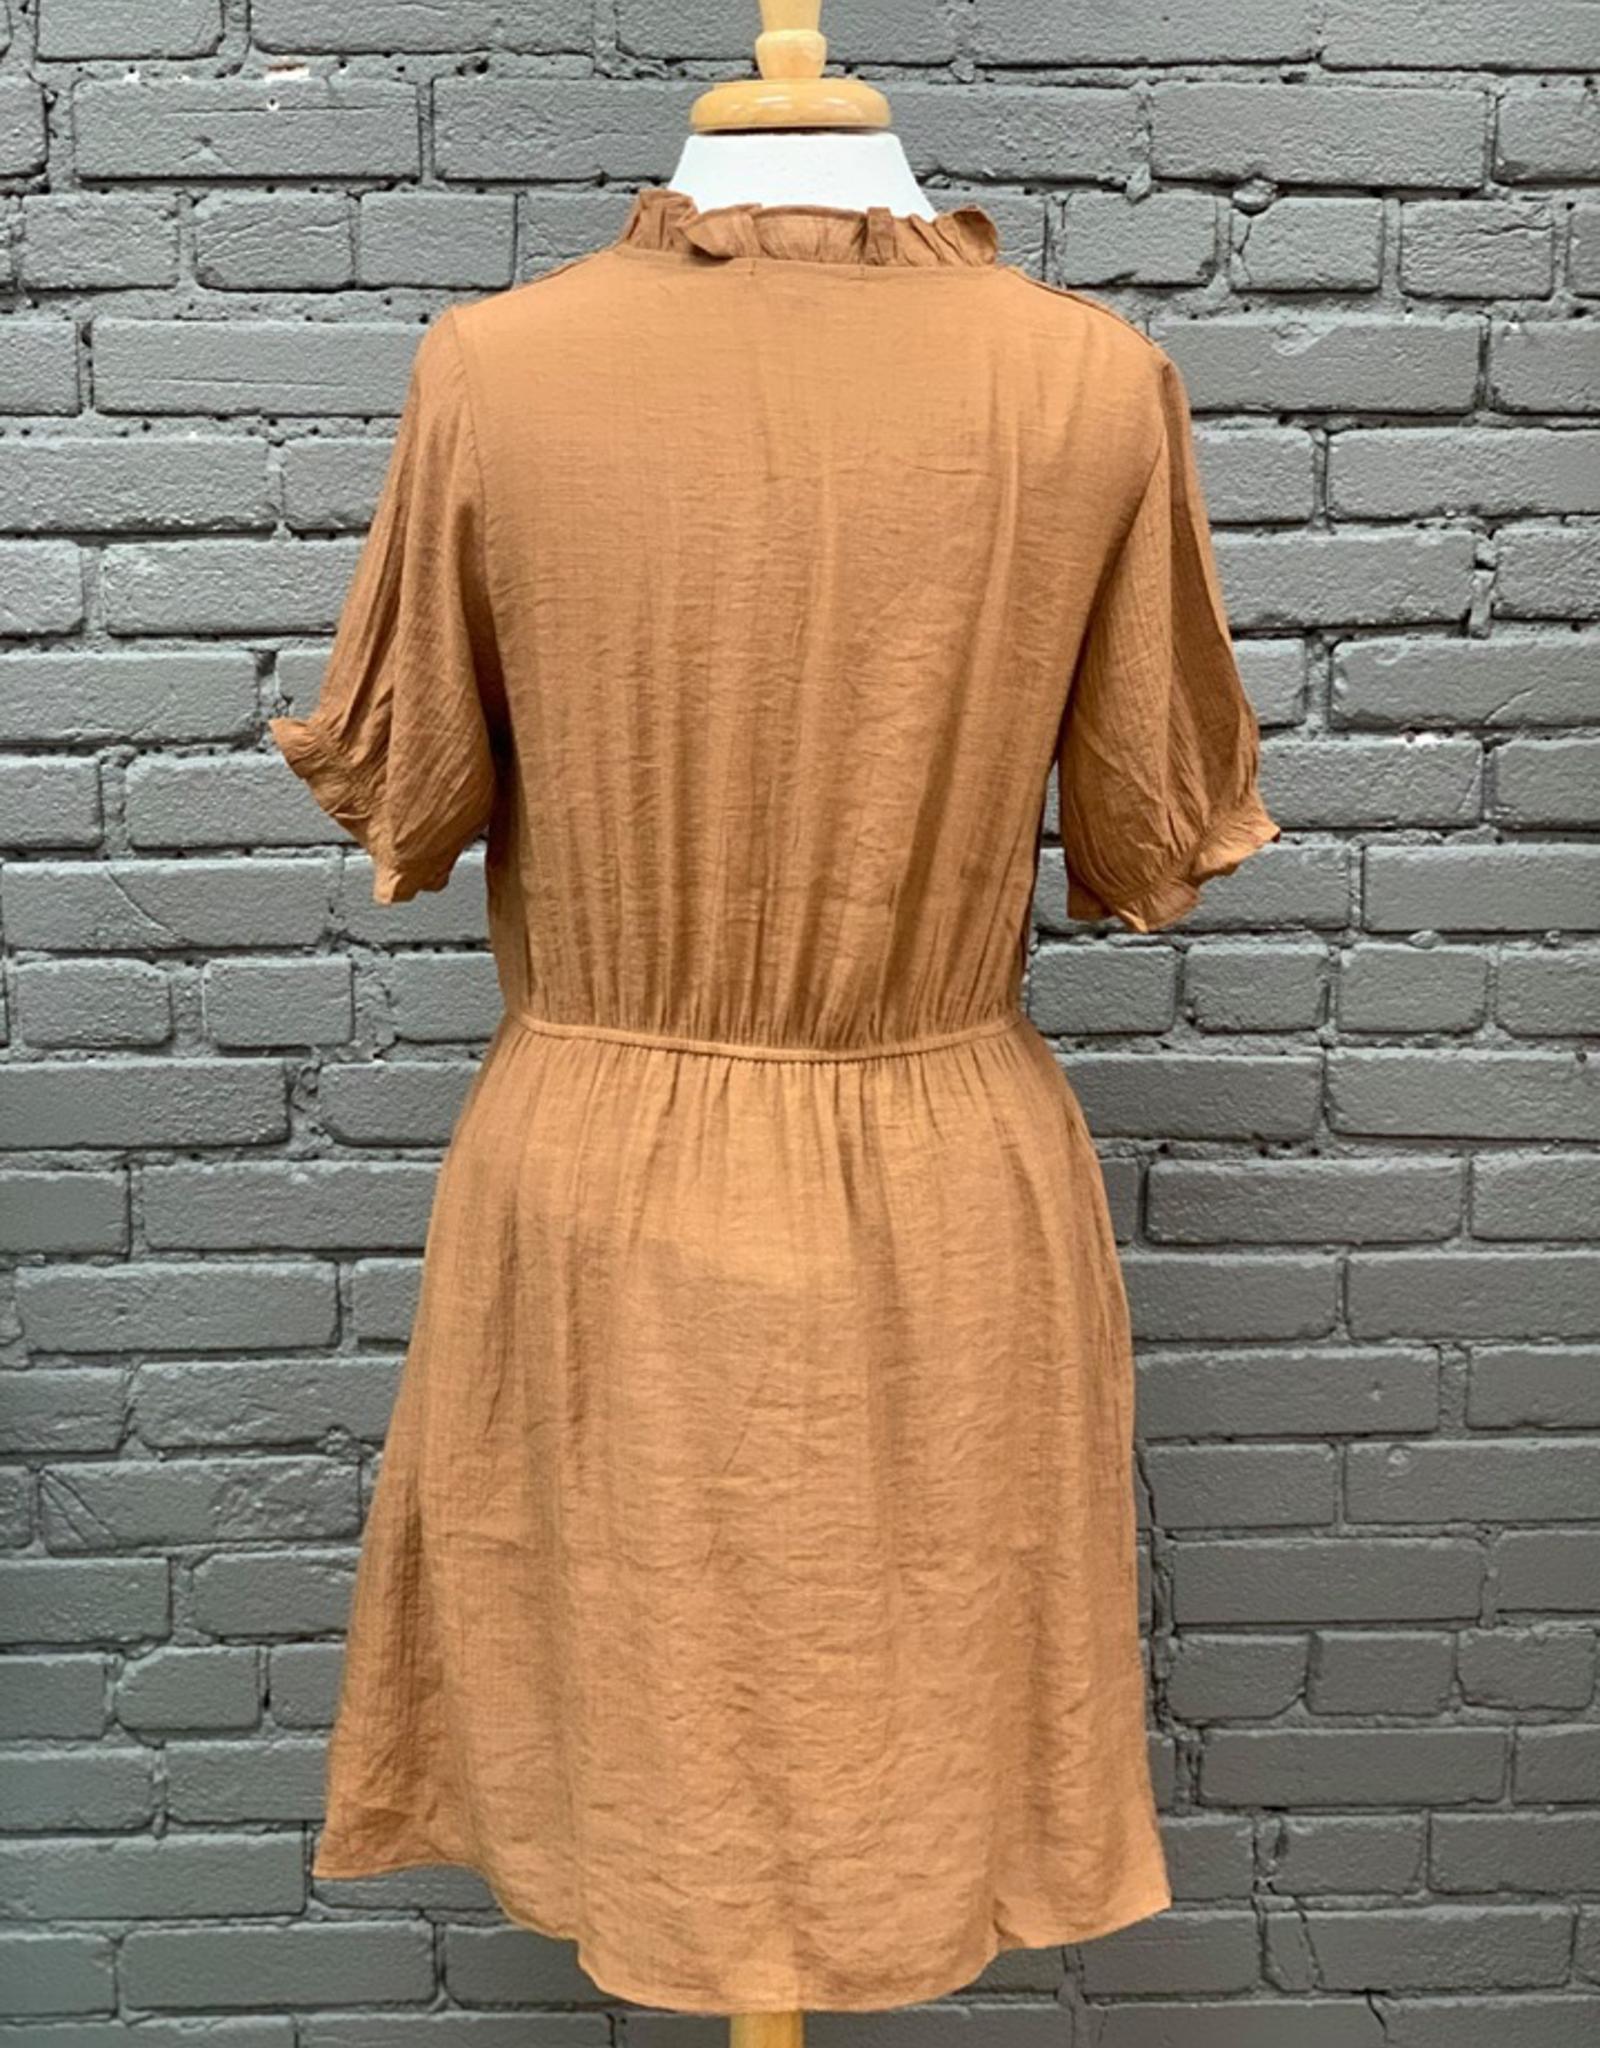 Dress Tia Short Sleeve w/ Ruffle Neck Dress